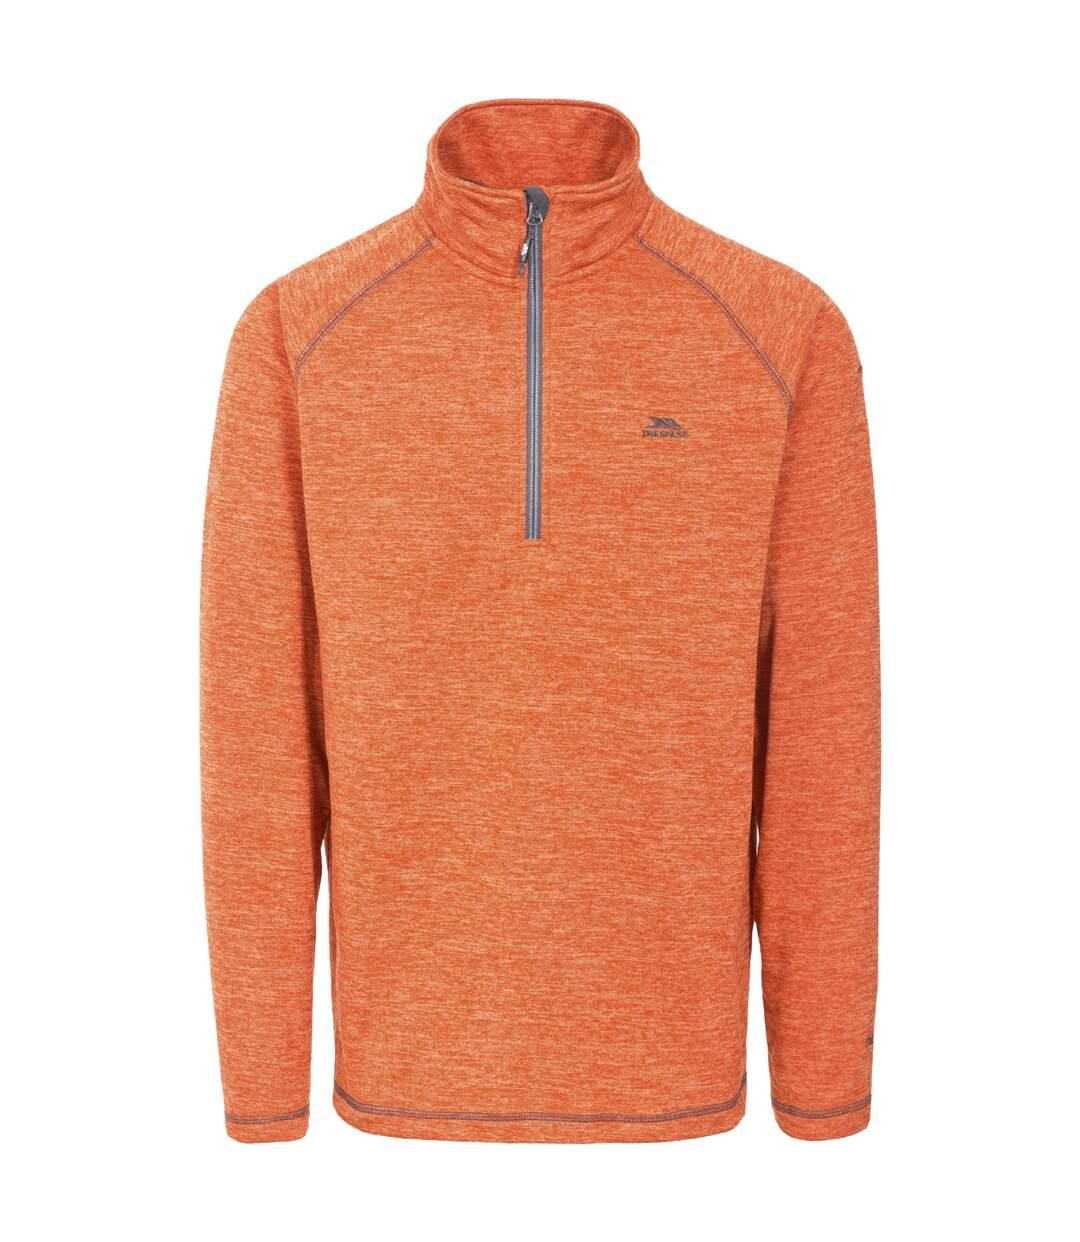 Trespass Mens Bungy Fleece (Burnt Orange Marl) - UTTP4061